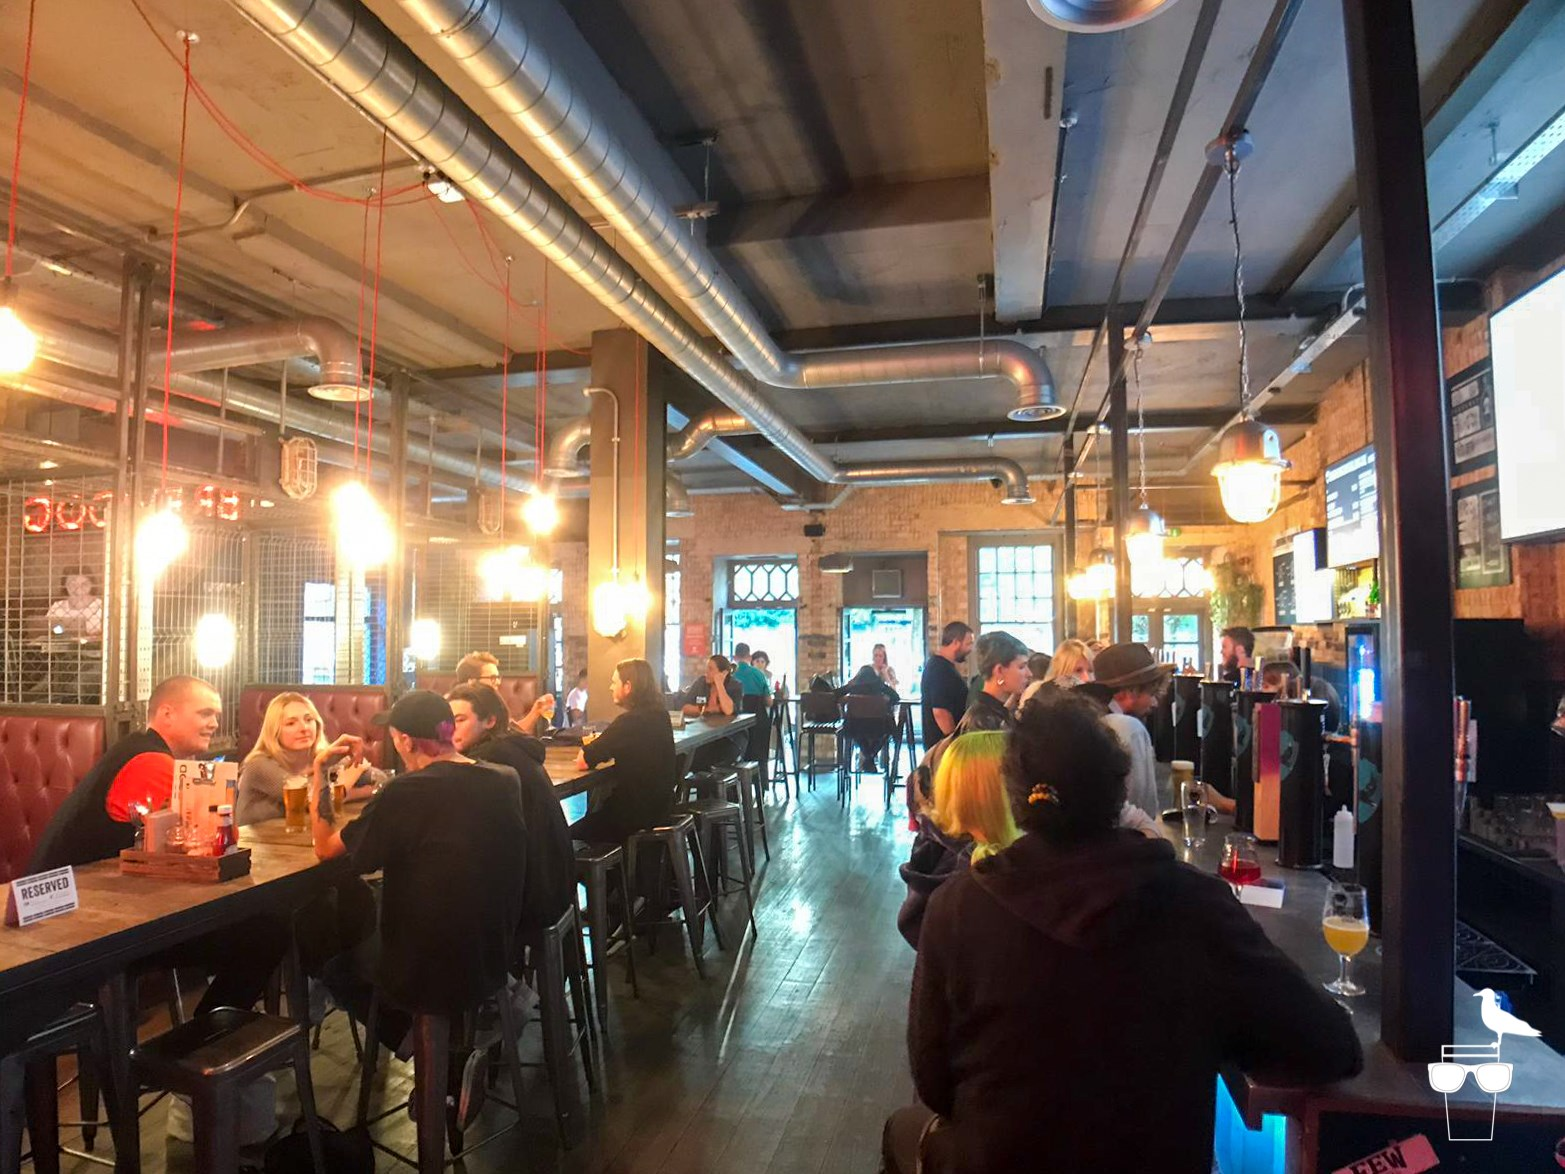 brewdog brighton customers at the bar